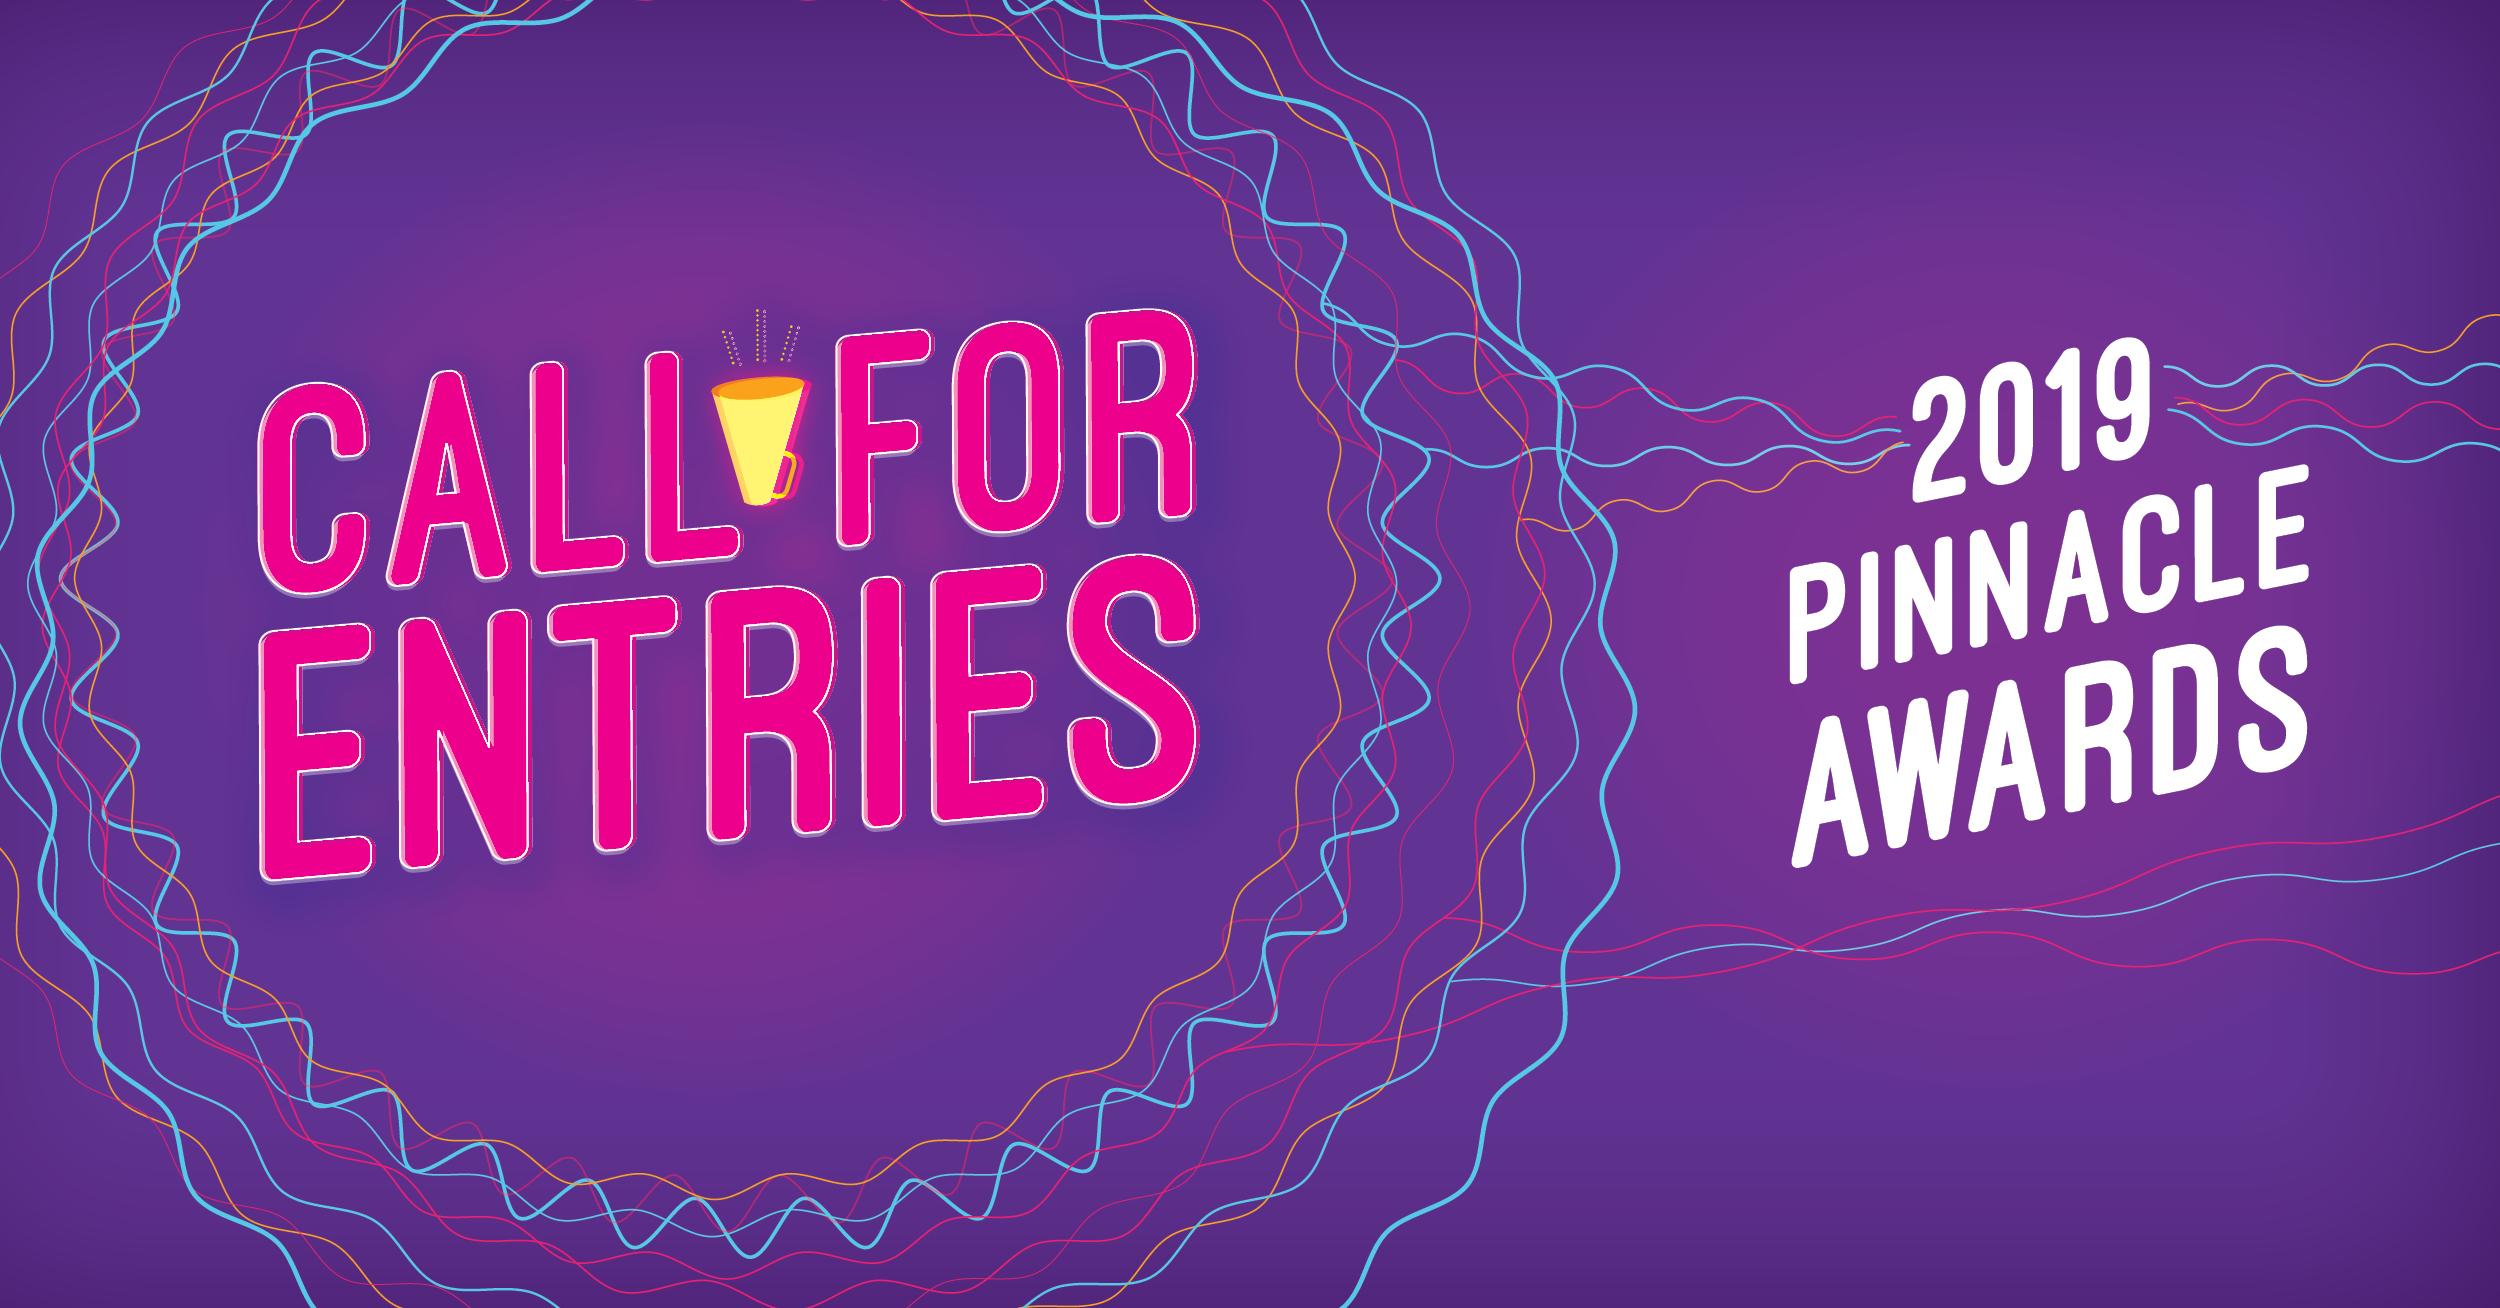 2019 AMA Omaha Pinnacle Awards Call for Entries